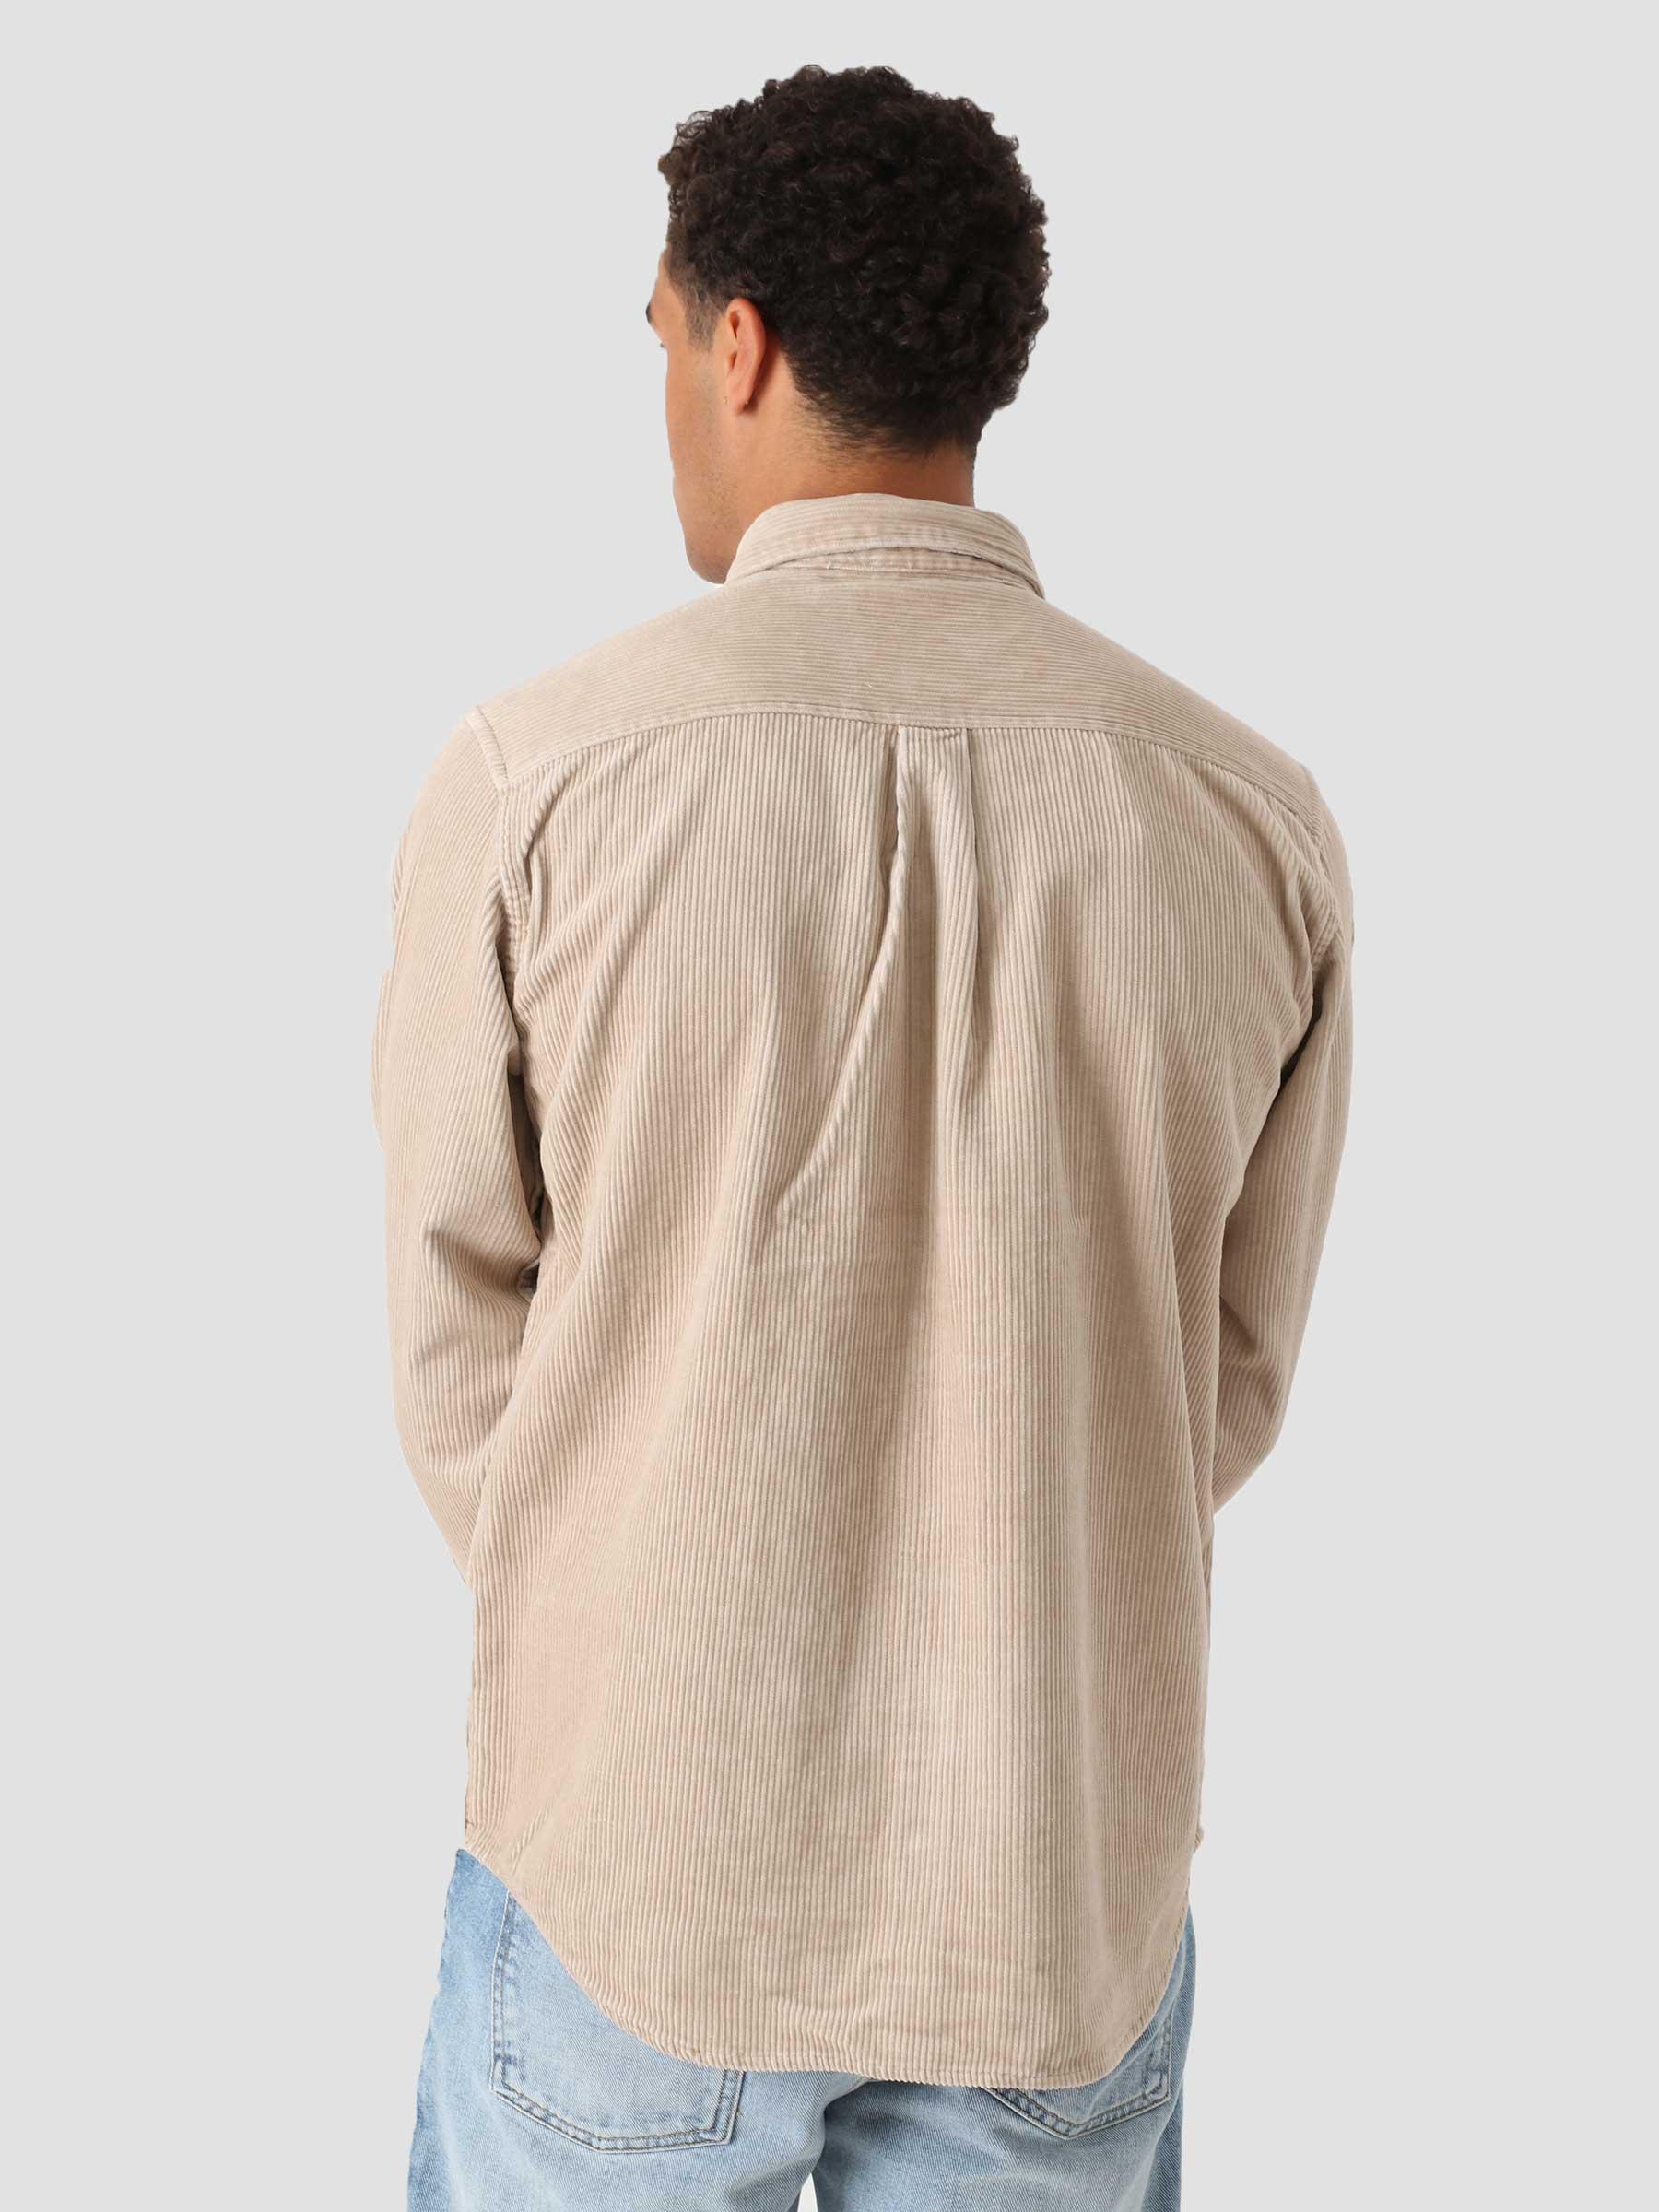 Longsleeve Madison Cord Shirt Wall Black I029958